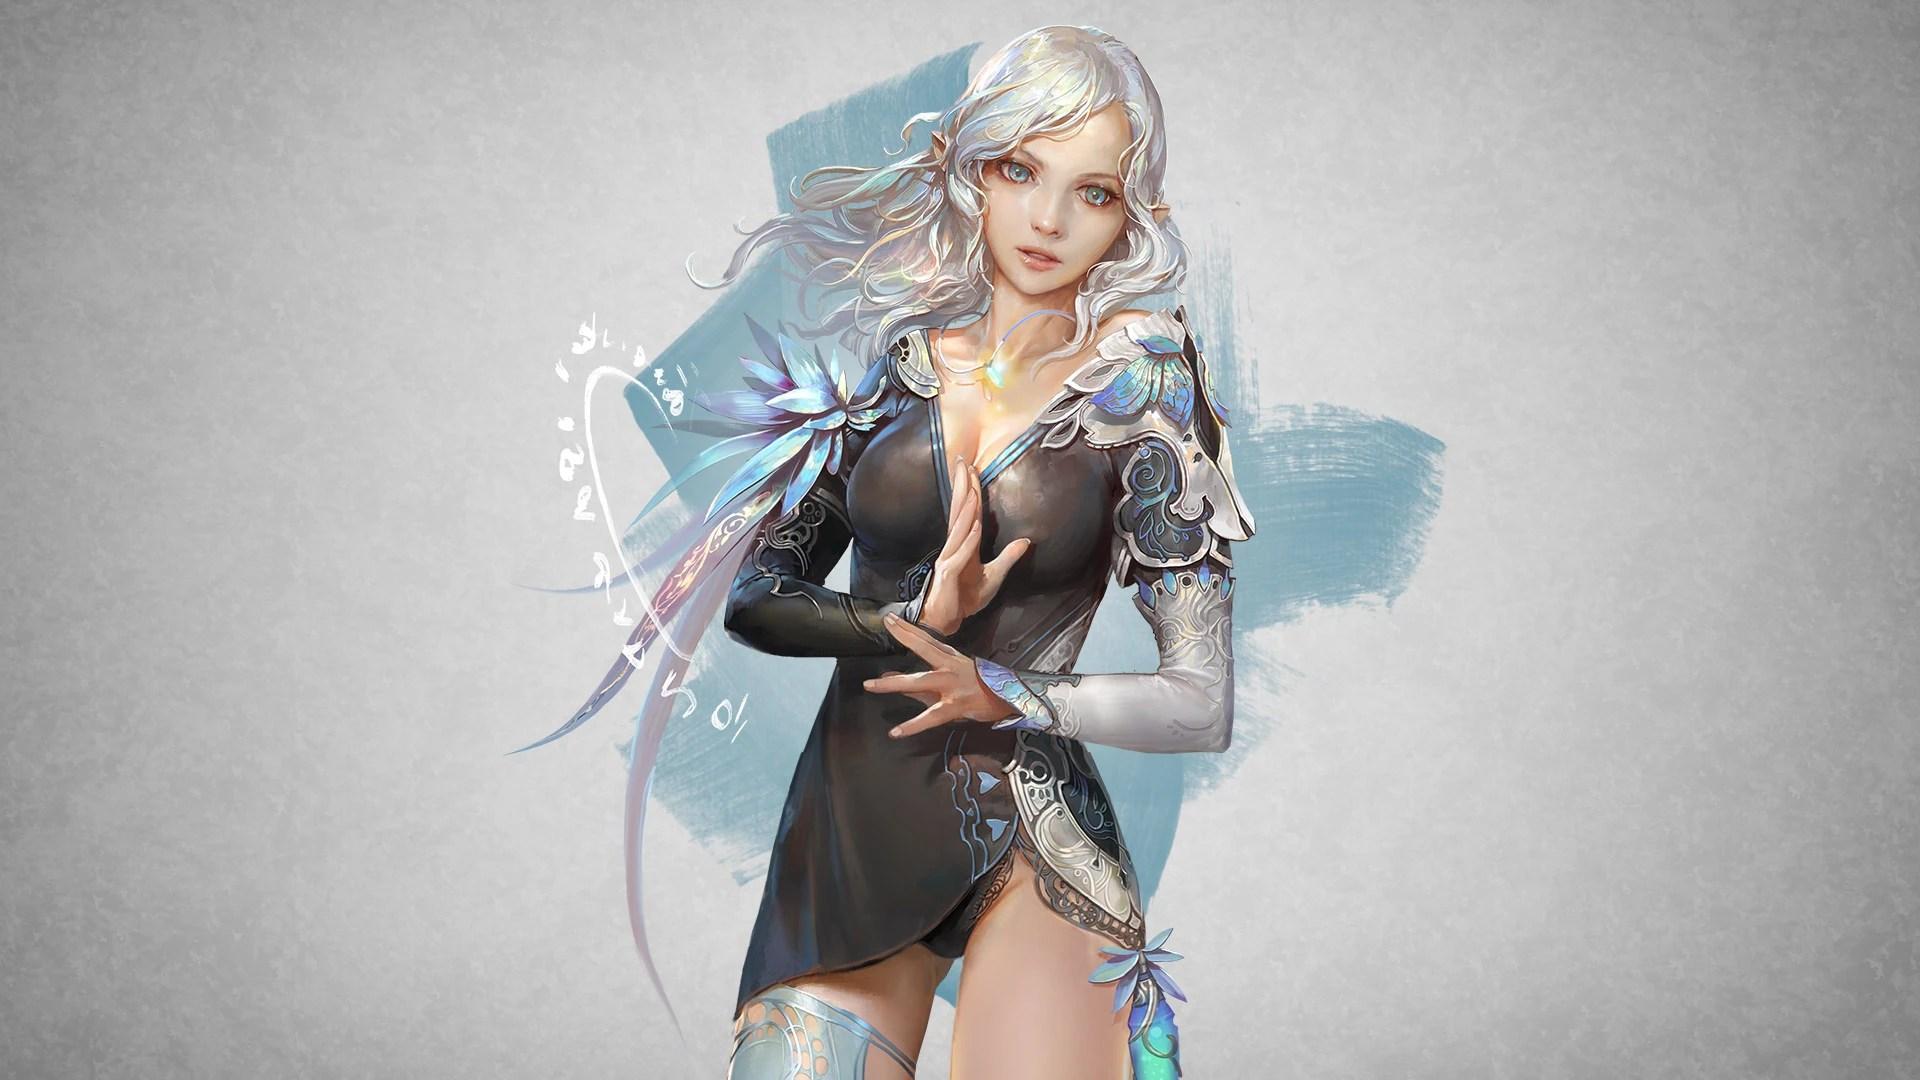 3d Name Wallpaper Editor Online Archeage Elf Female Steam Trading Cards Wiki Fandom